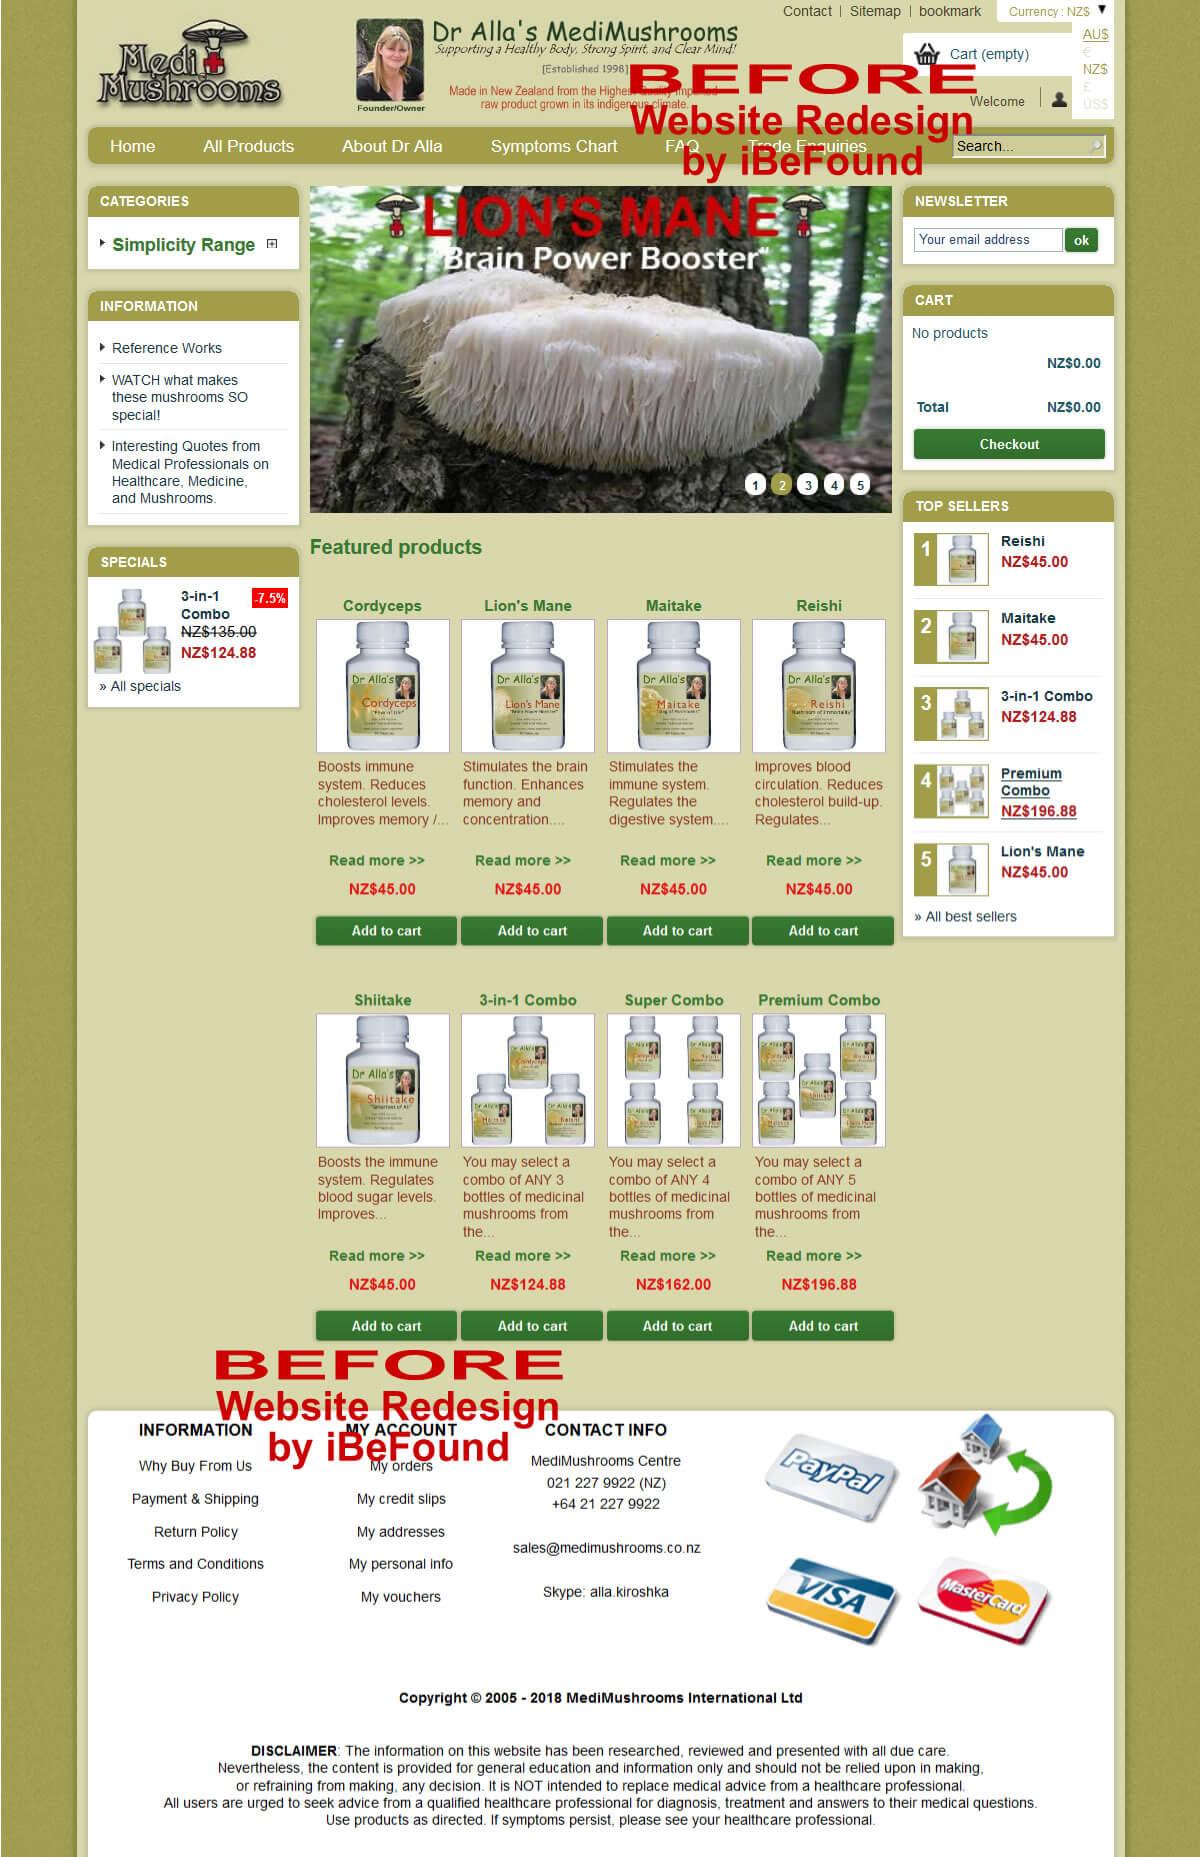 Homepage Of MediMushrooms International Ltd Before Website Redesign By IBeFound Digital Marketing Division